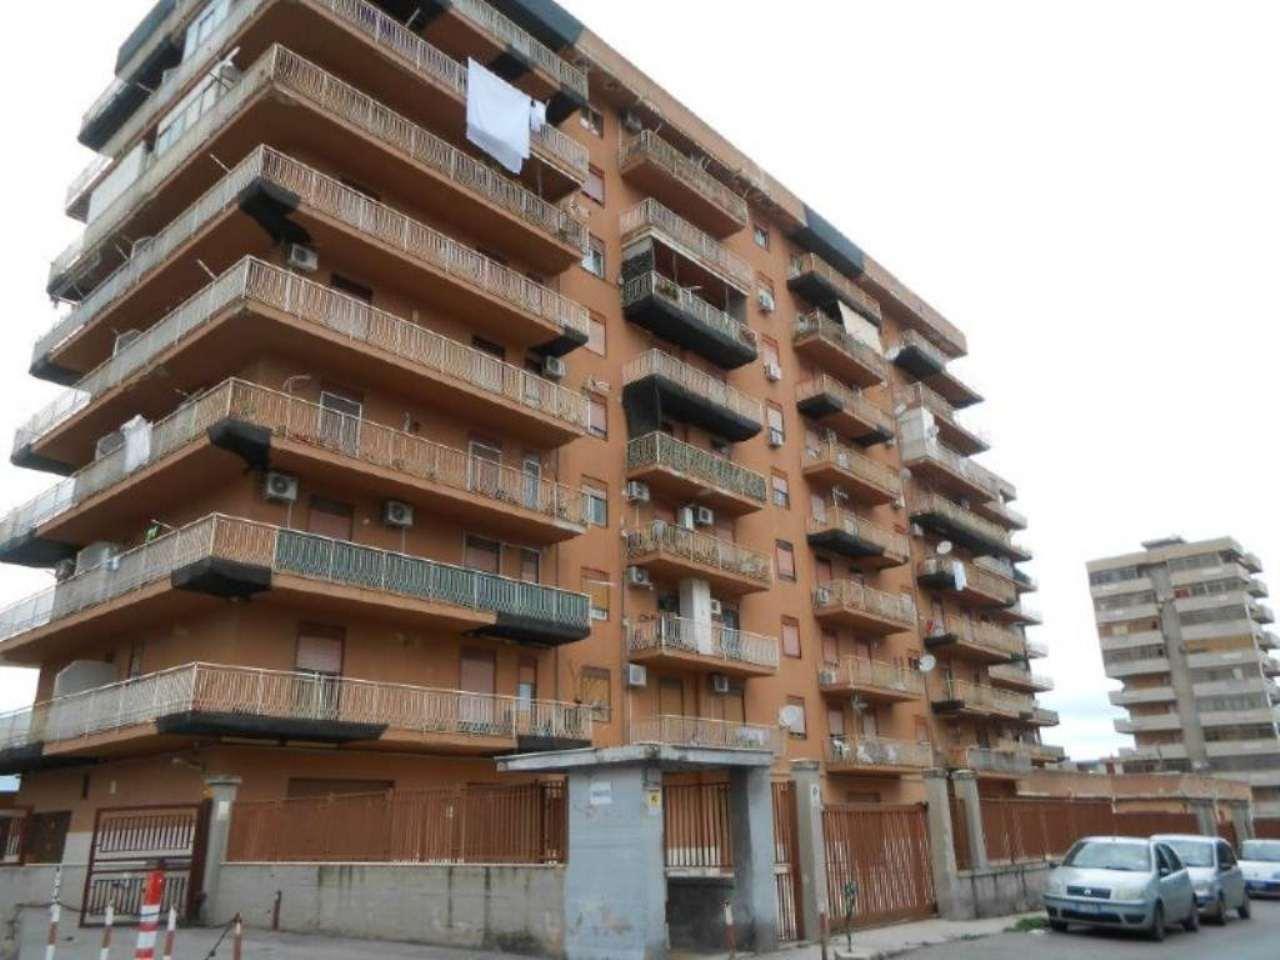 Bilocale Palermo Largo Os 2 9